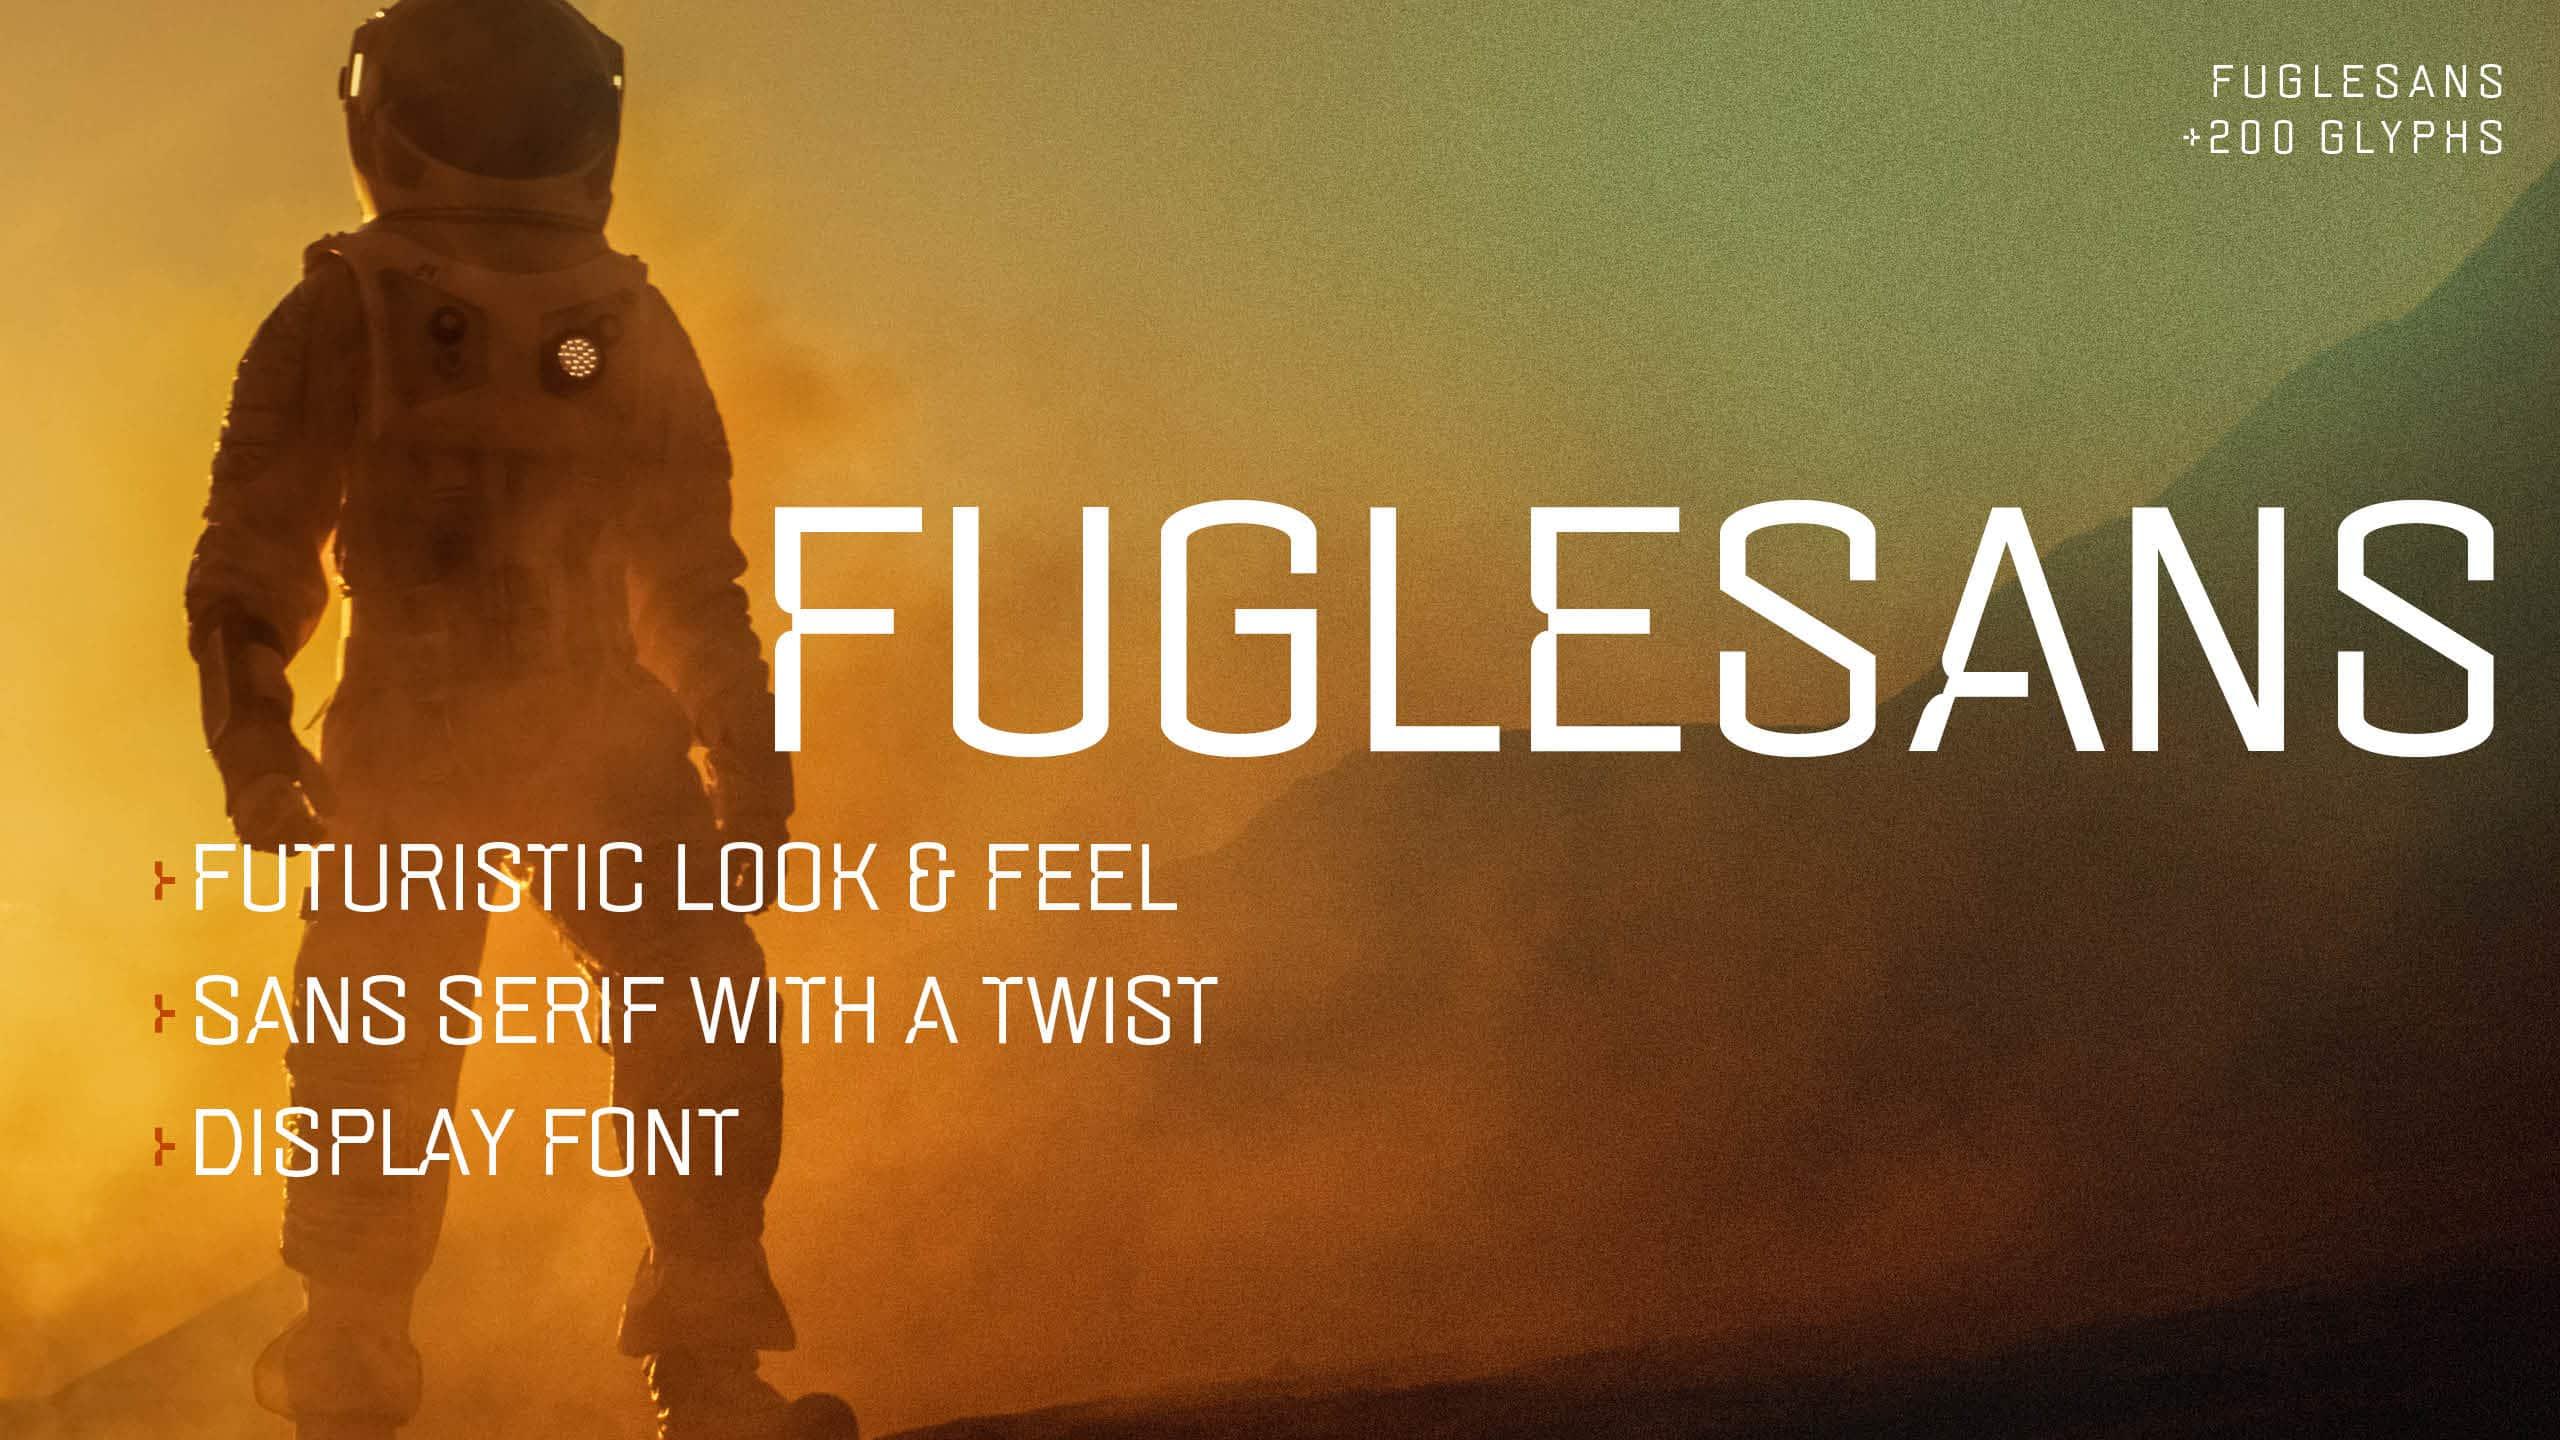 Marketing image for the font Fuglesans, concept image.